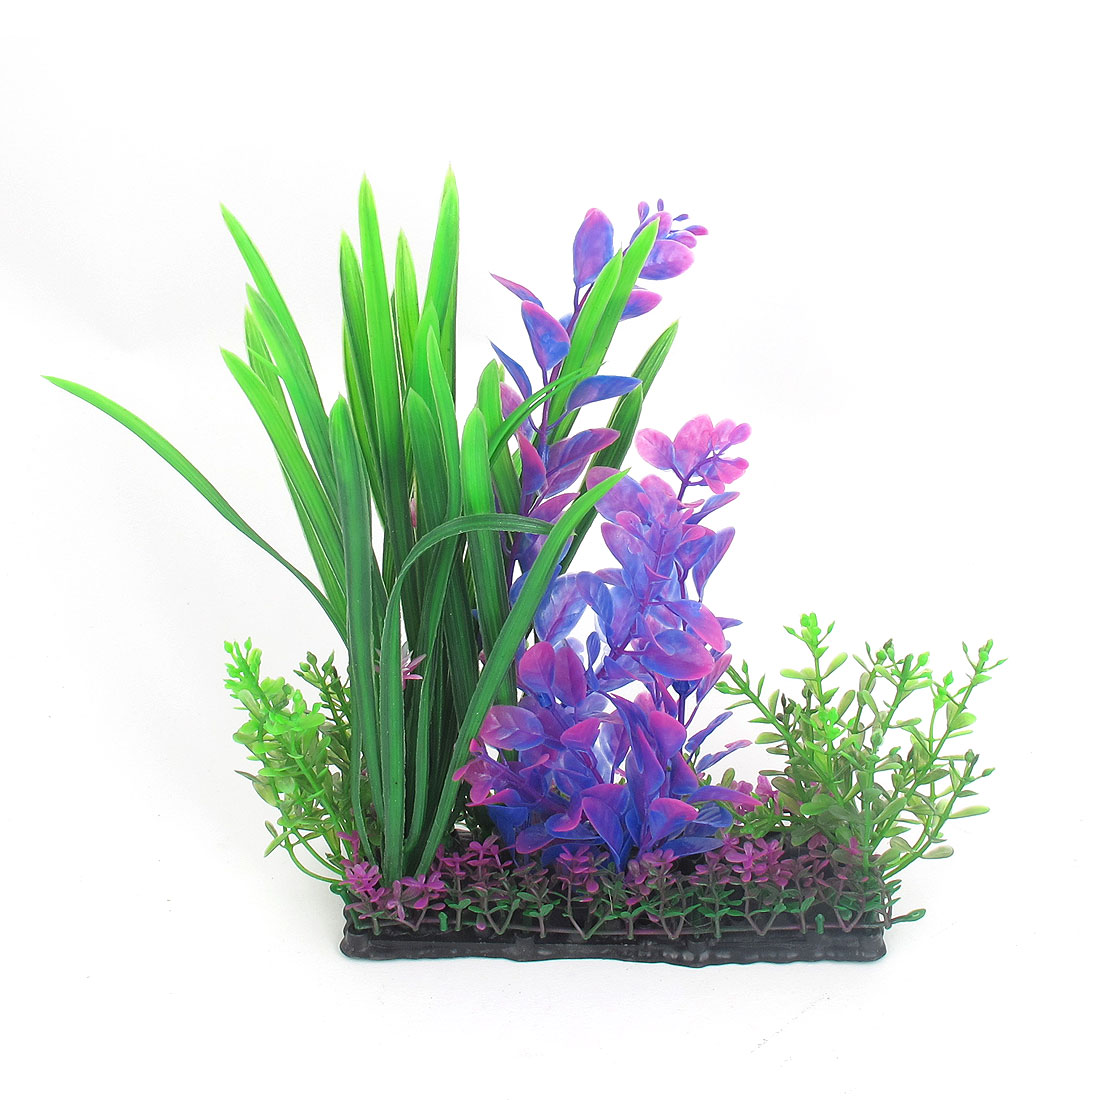 "8.7"" Height Multicolour Plastic Artificial Ornament Rectangle Plant for Aquarium Fish Tank"